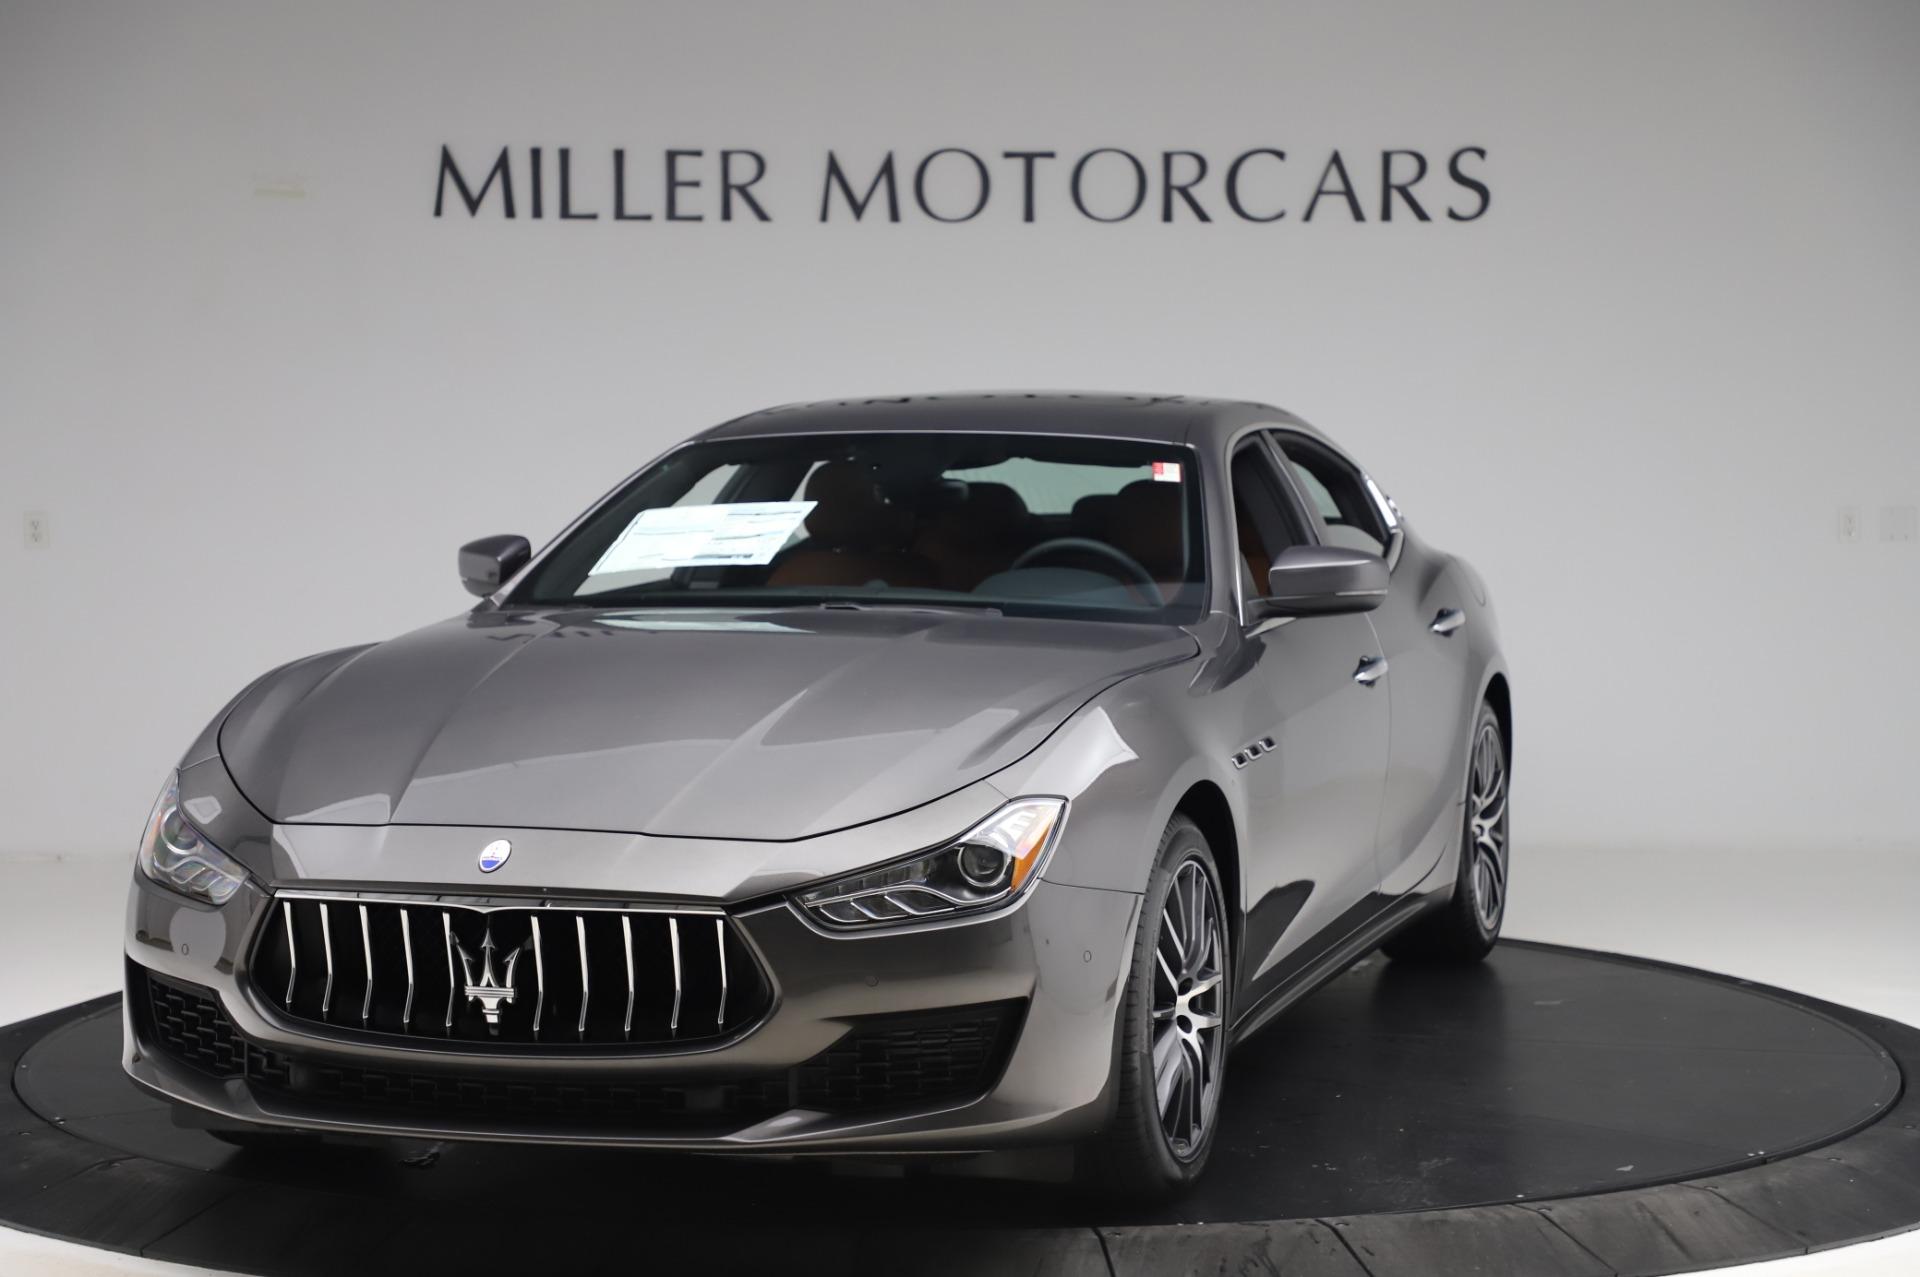 New 2020 Maserati Ghibli S Q4 for sale Sold at Alfa Romeo of Greenwich in Greenwich CT 06830 1